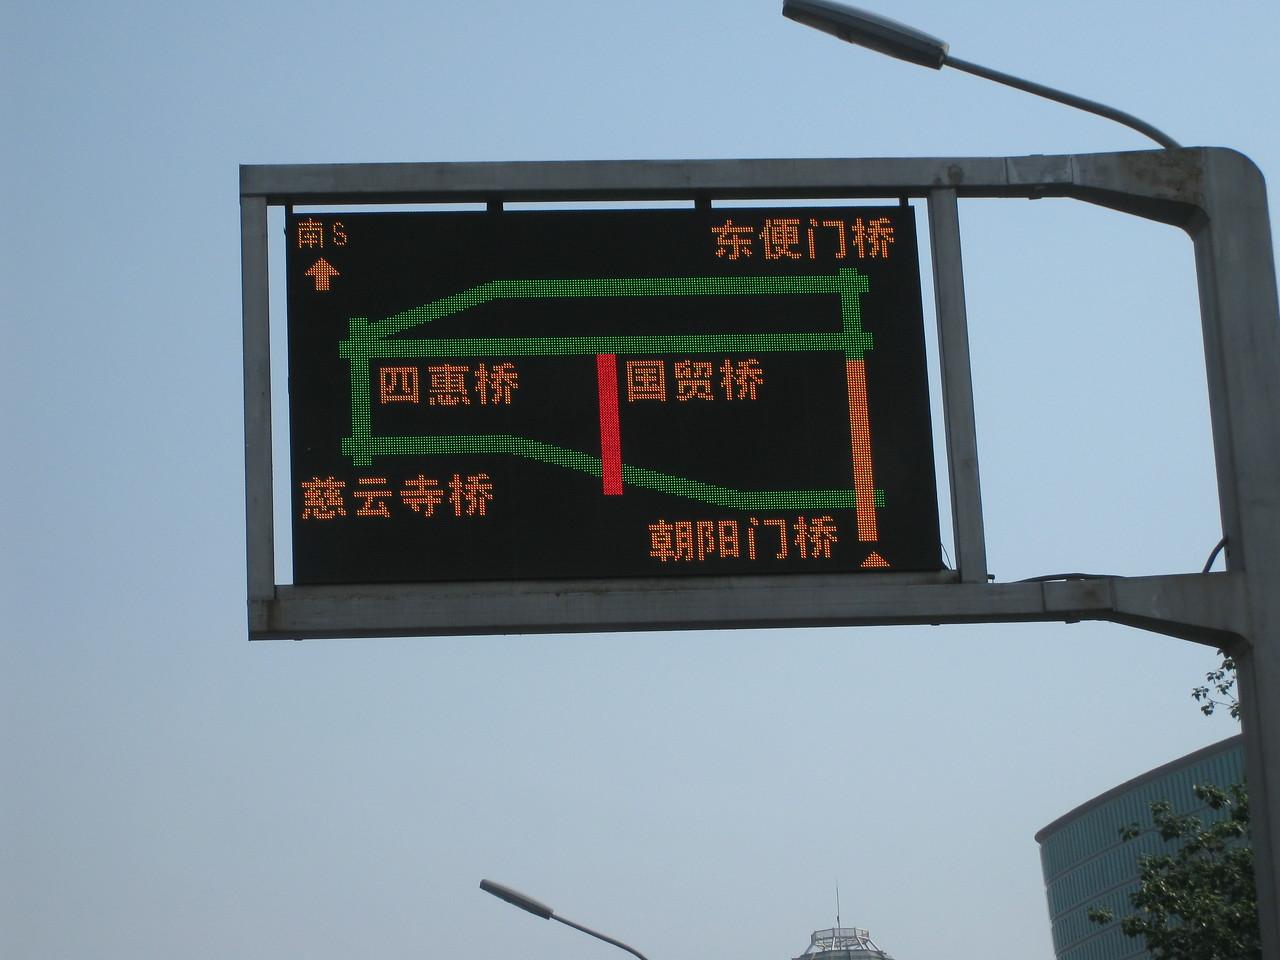 Chinese traffic info?